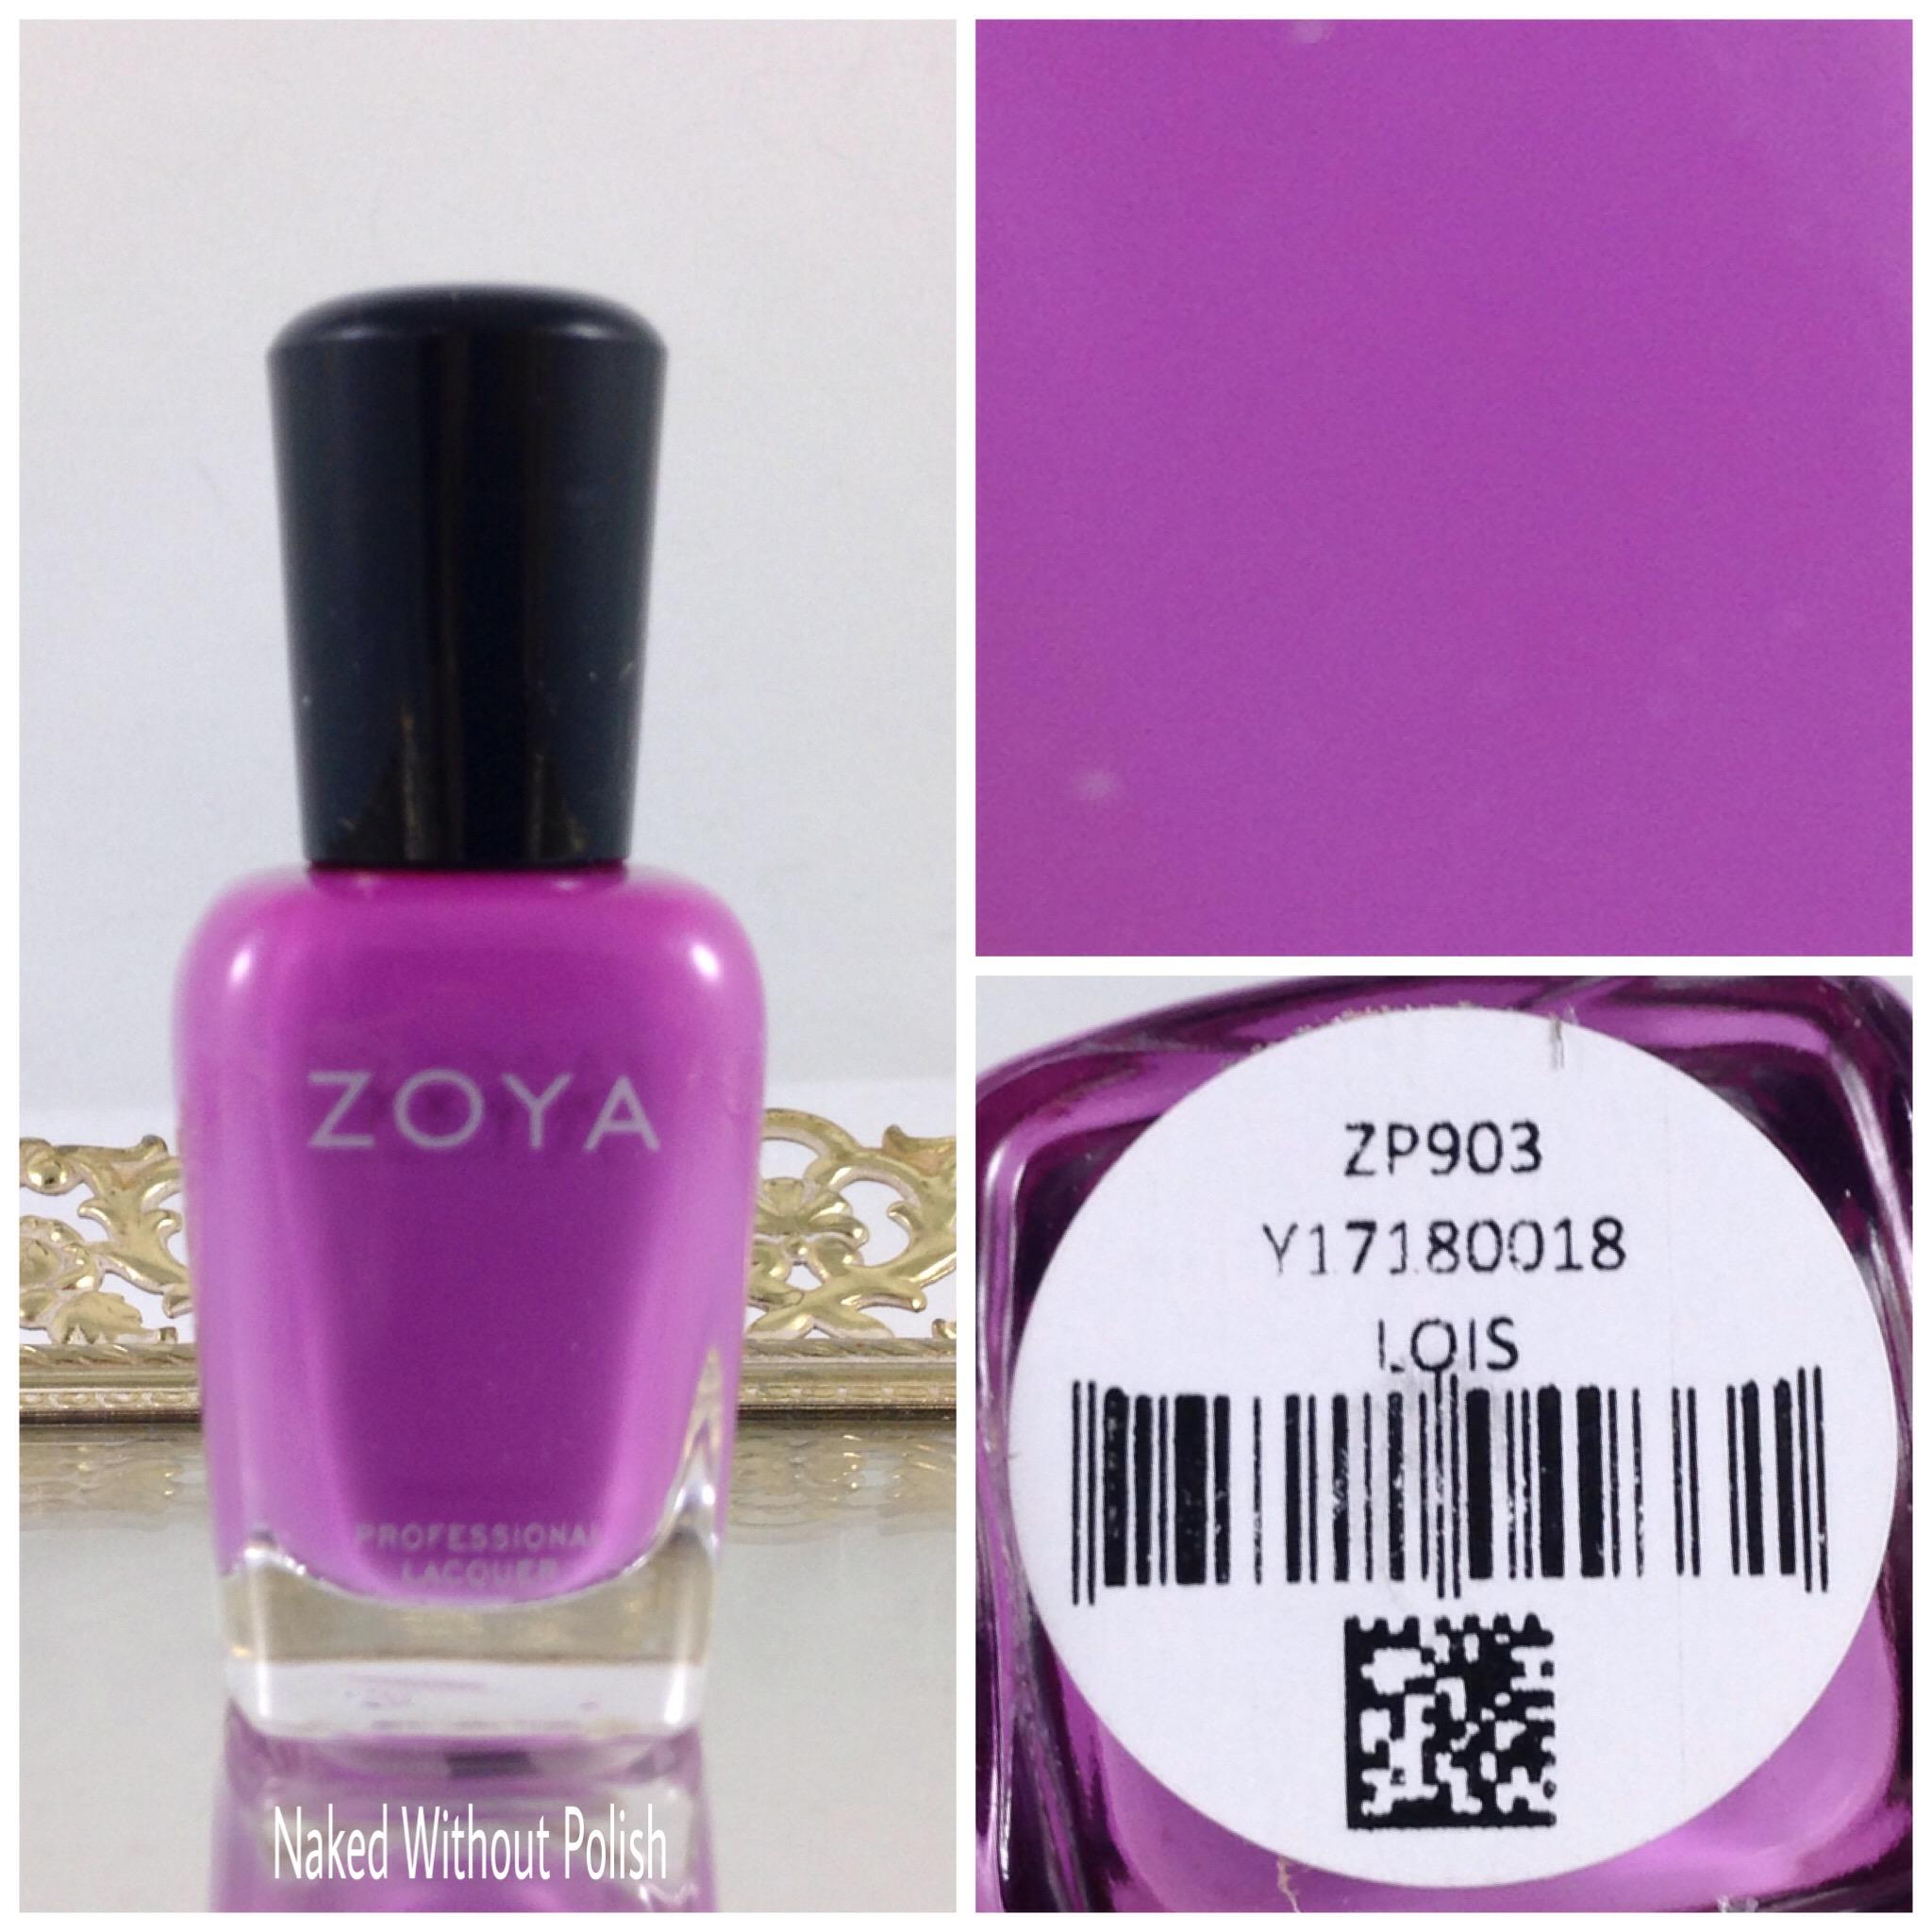 Zoya-Lois-1